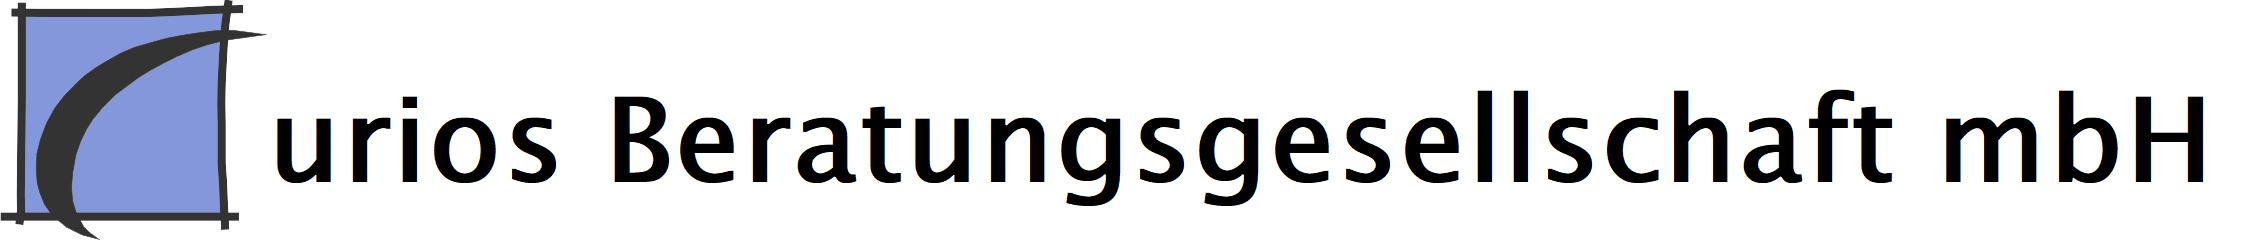 Logo urios Beratungsgesellschaft mbH